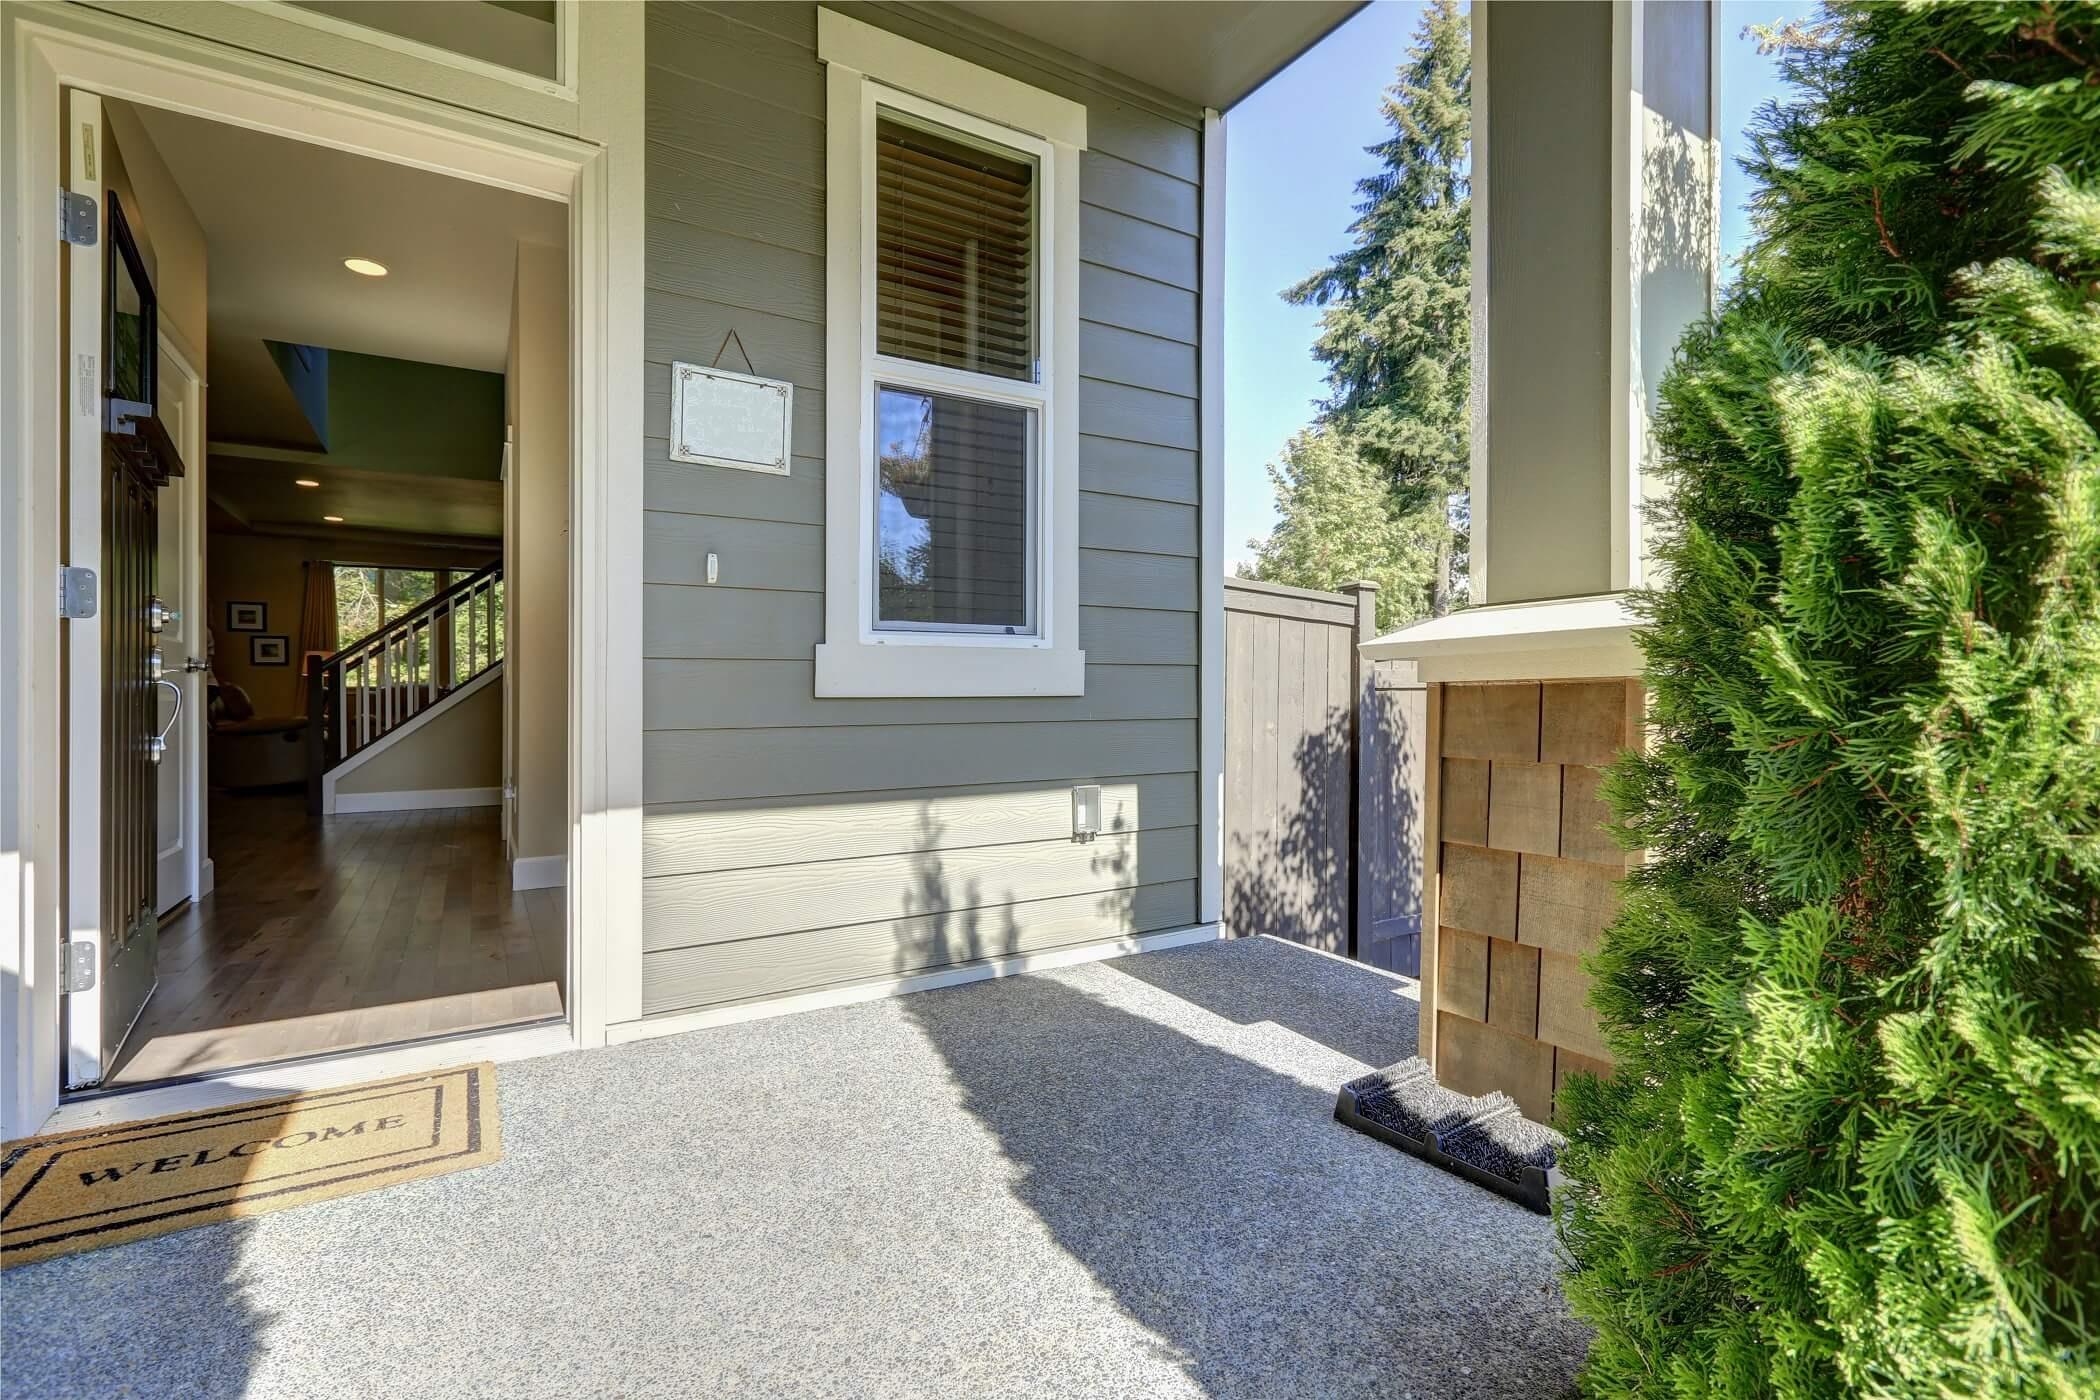 Lake Stevens Homes for Sale, Lake Stevens, WA Real Estate